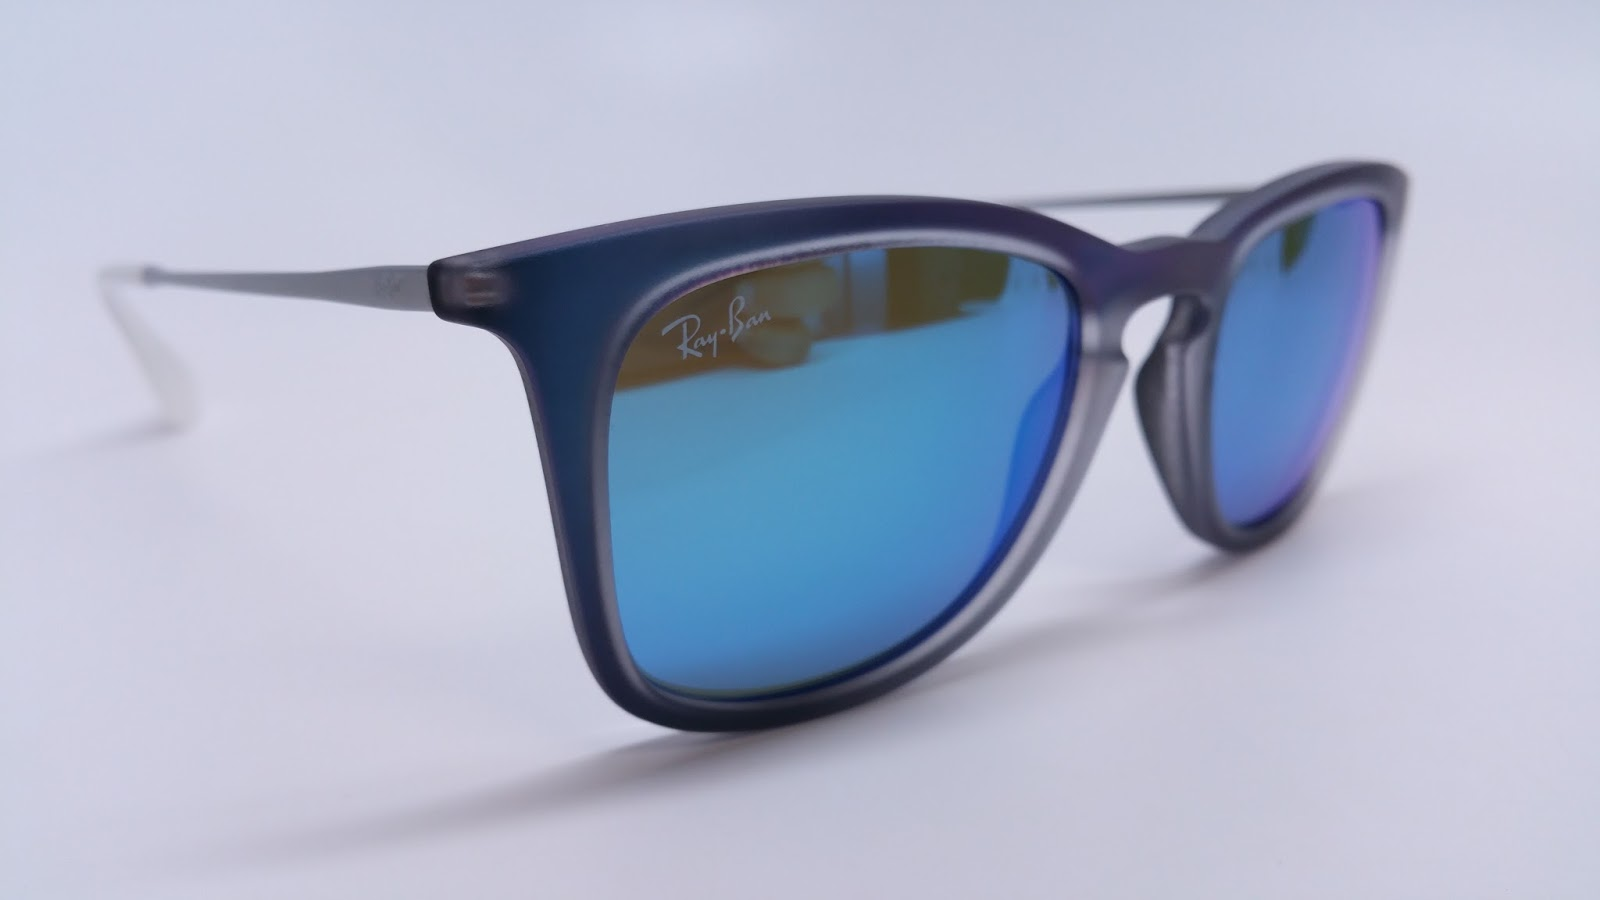 6e43dab91a Ray-Ban RB 4221 6170 55 Shot Blue Rubber Sunglasses